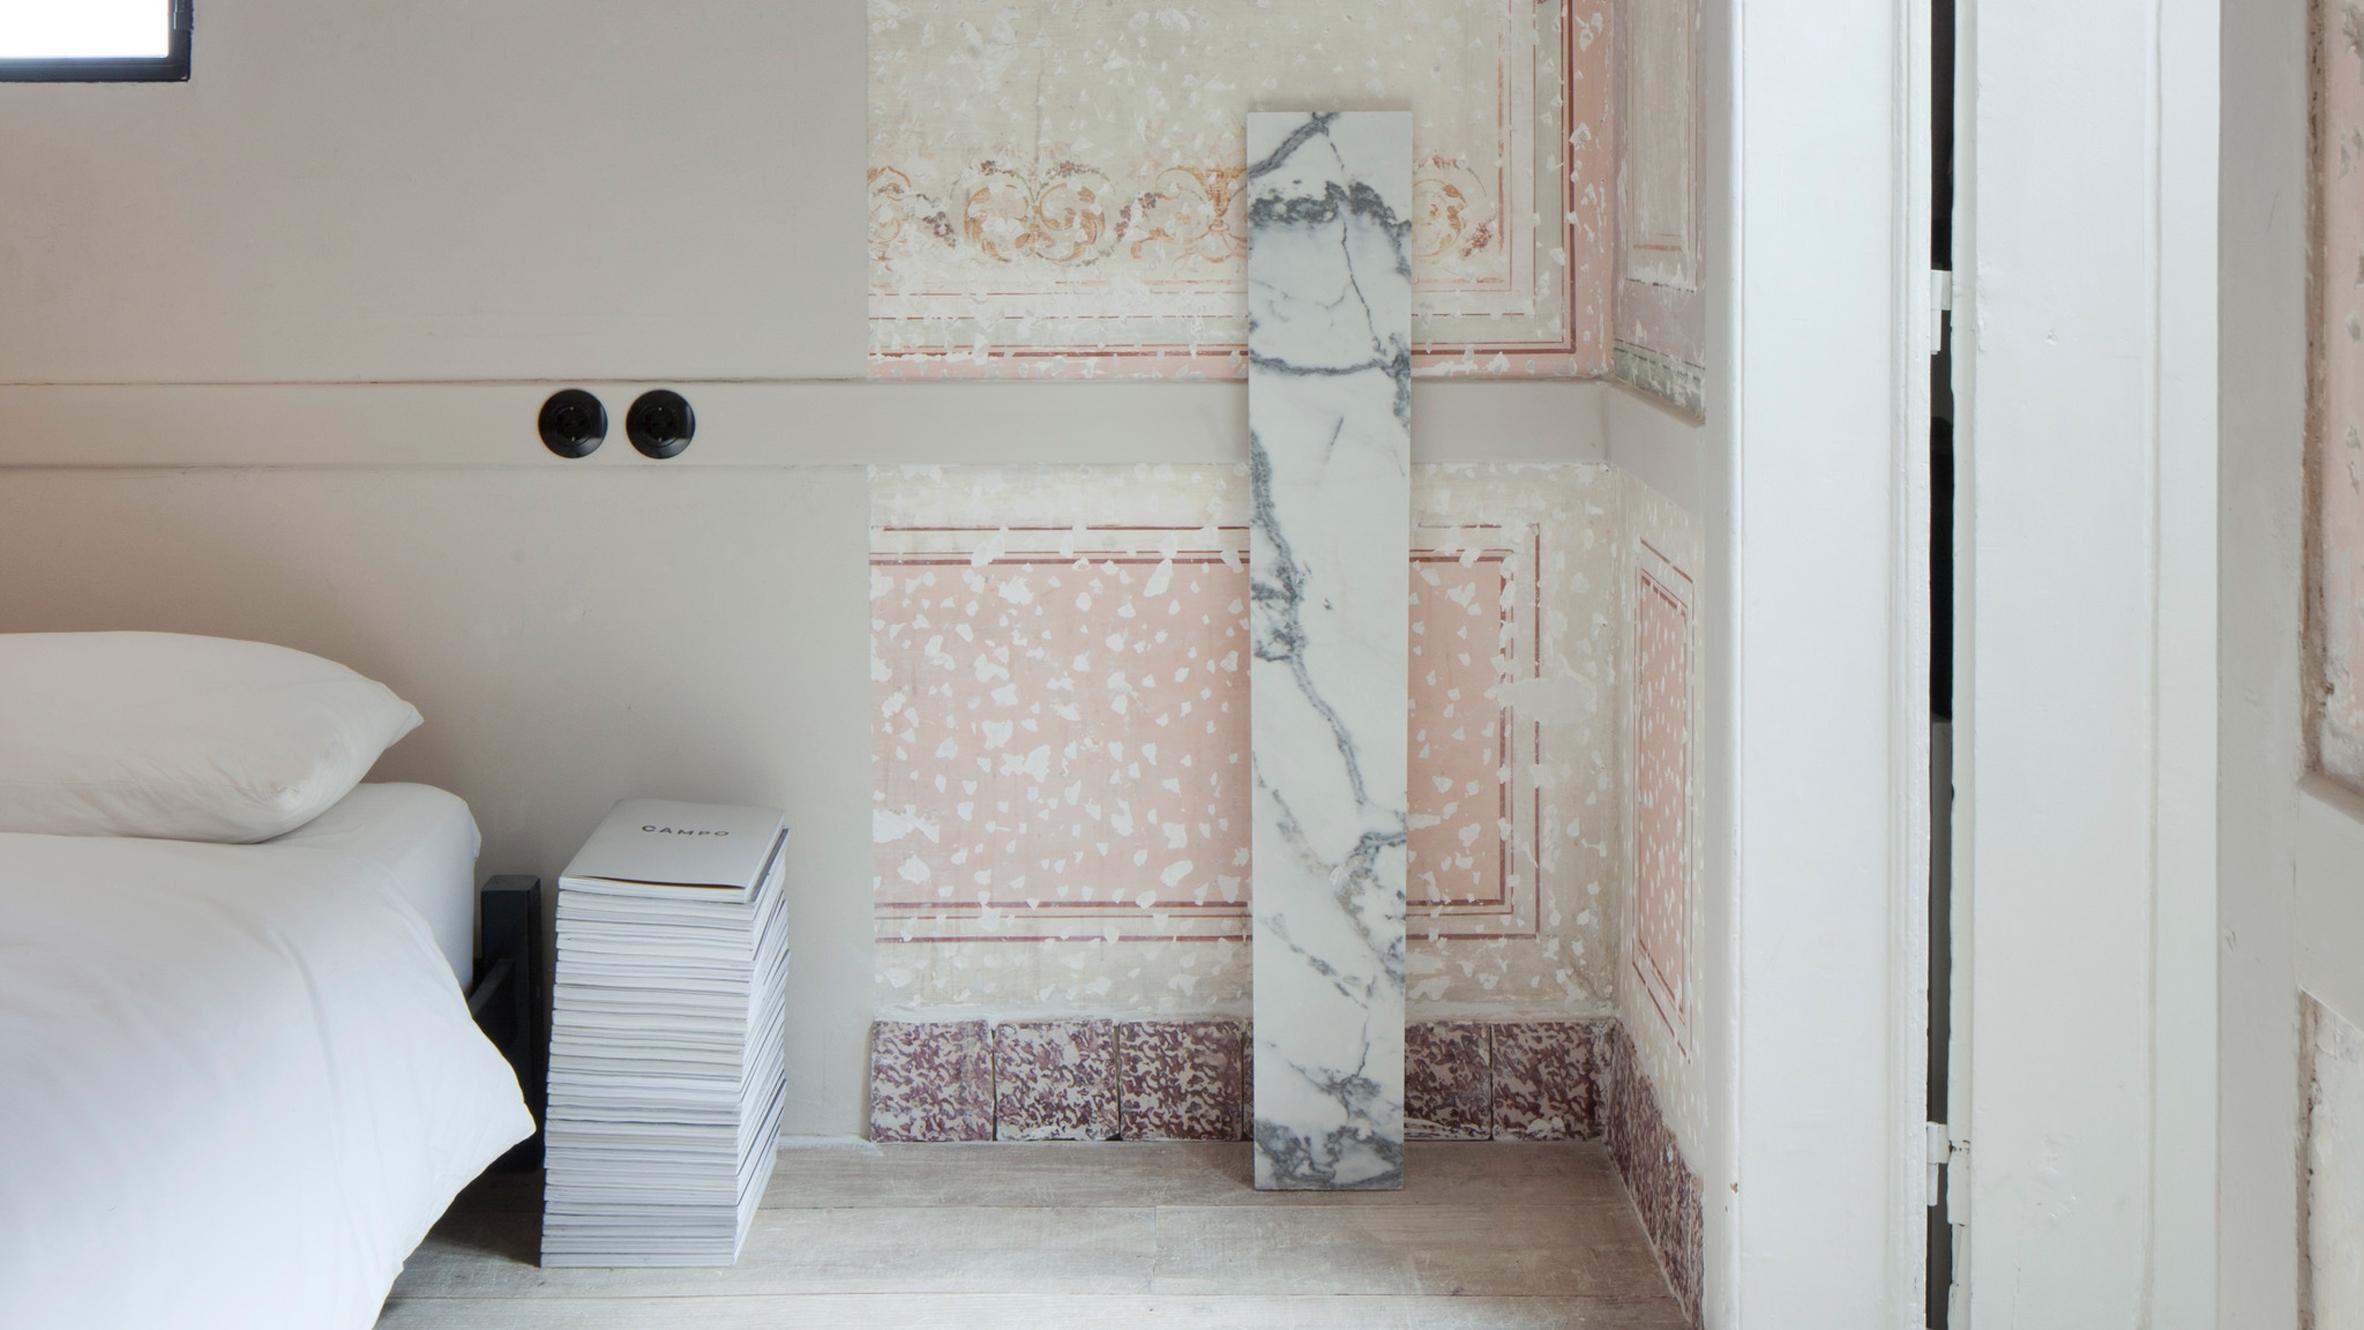 Lapa Apartment, Lisbon, Portugal, by Studio Gameiro